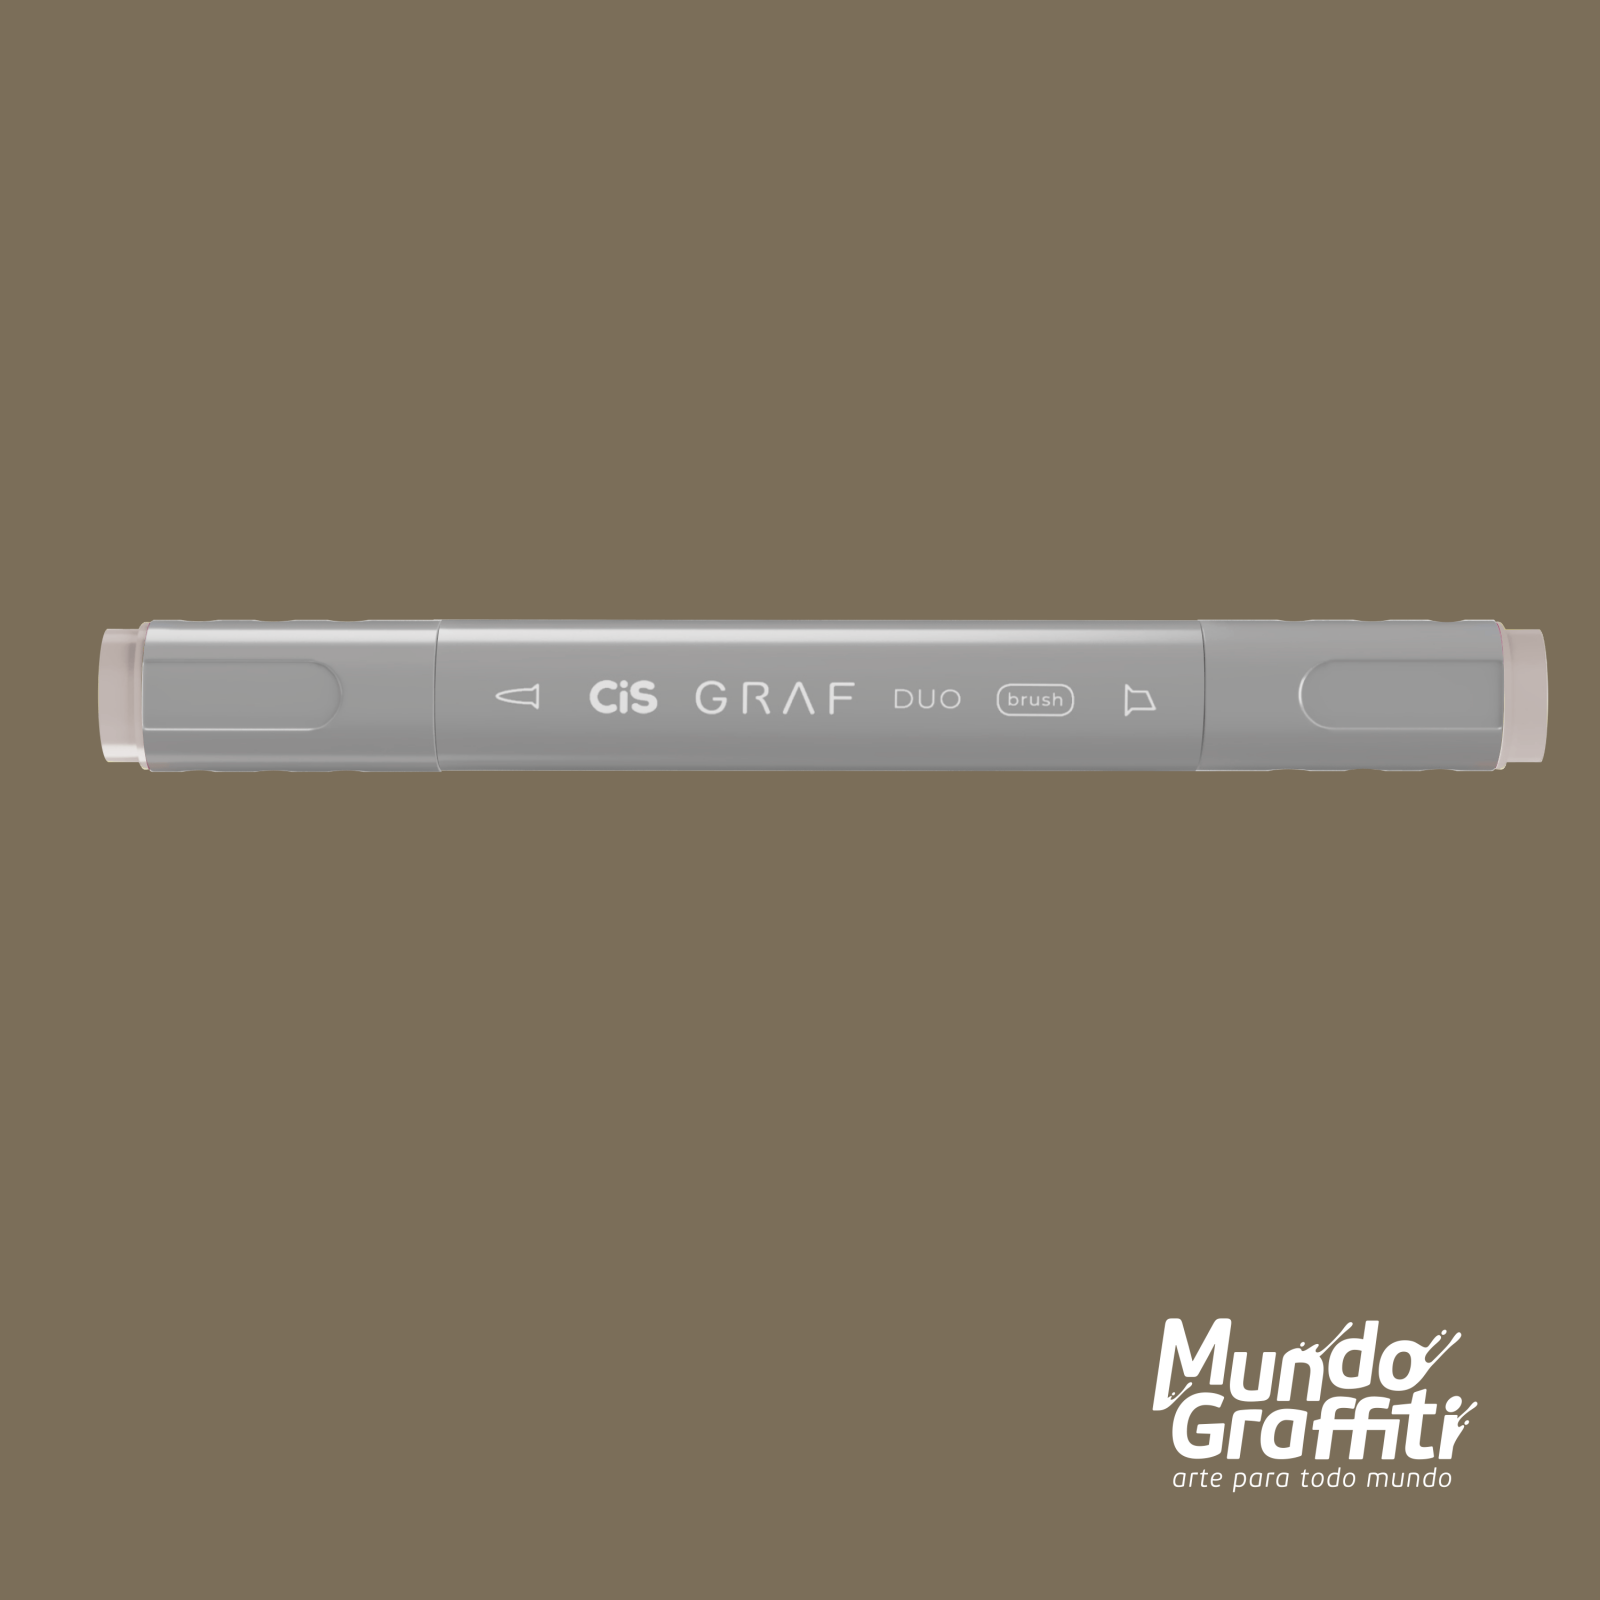 Marcador Cis Graf Duo Brush Warm Grey WG4 - Mundo Graffiti